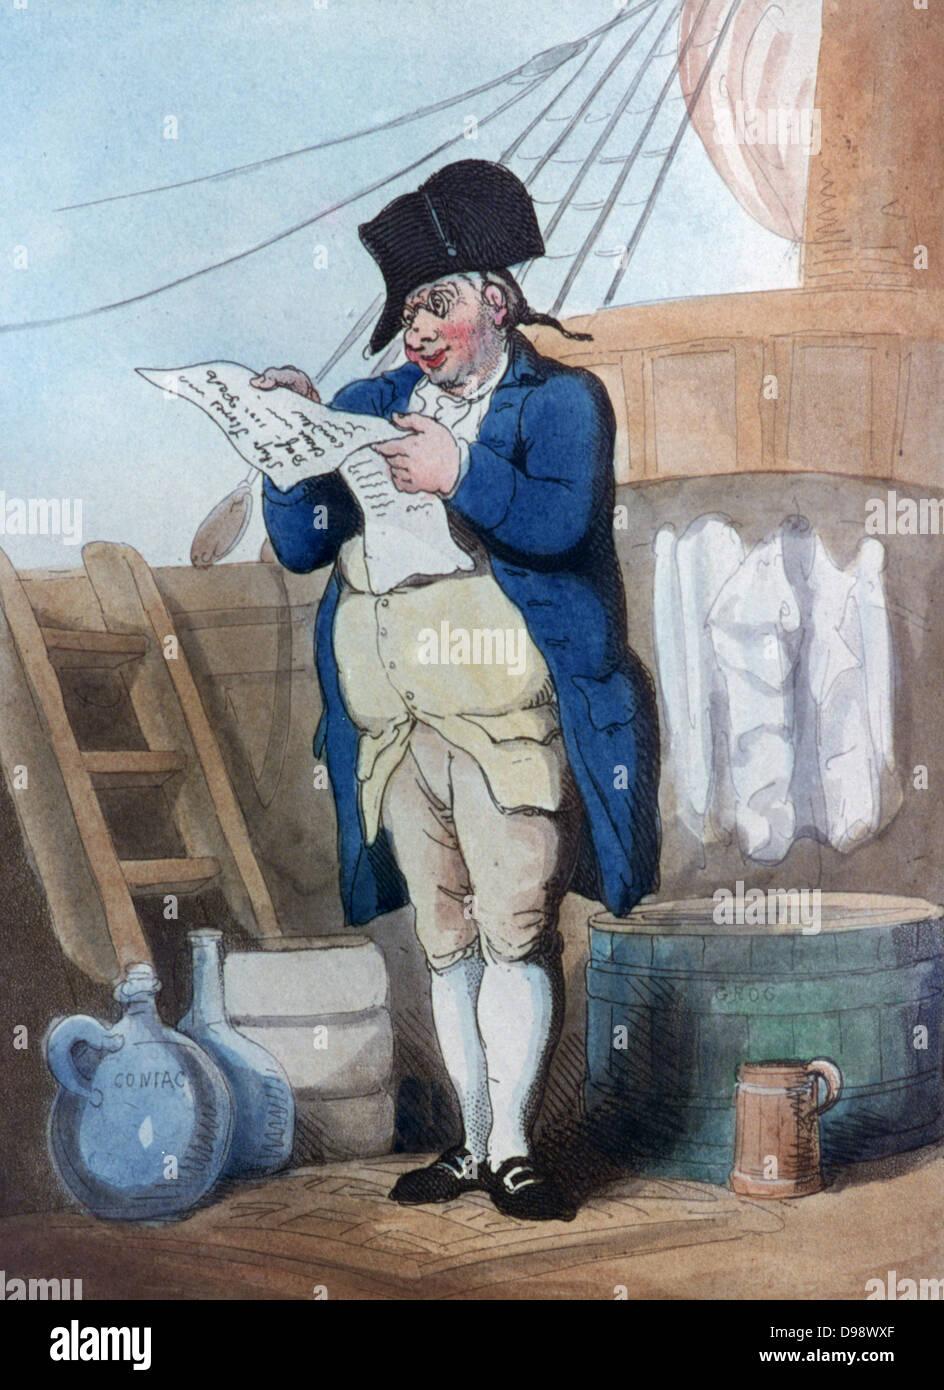 The Purser, 1799. Print by Thomas Rowlandson (1756-1827). Aquatint. - Stock Image